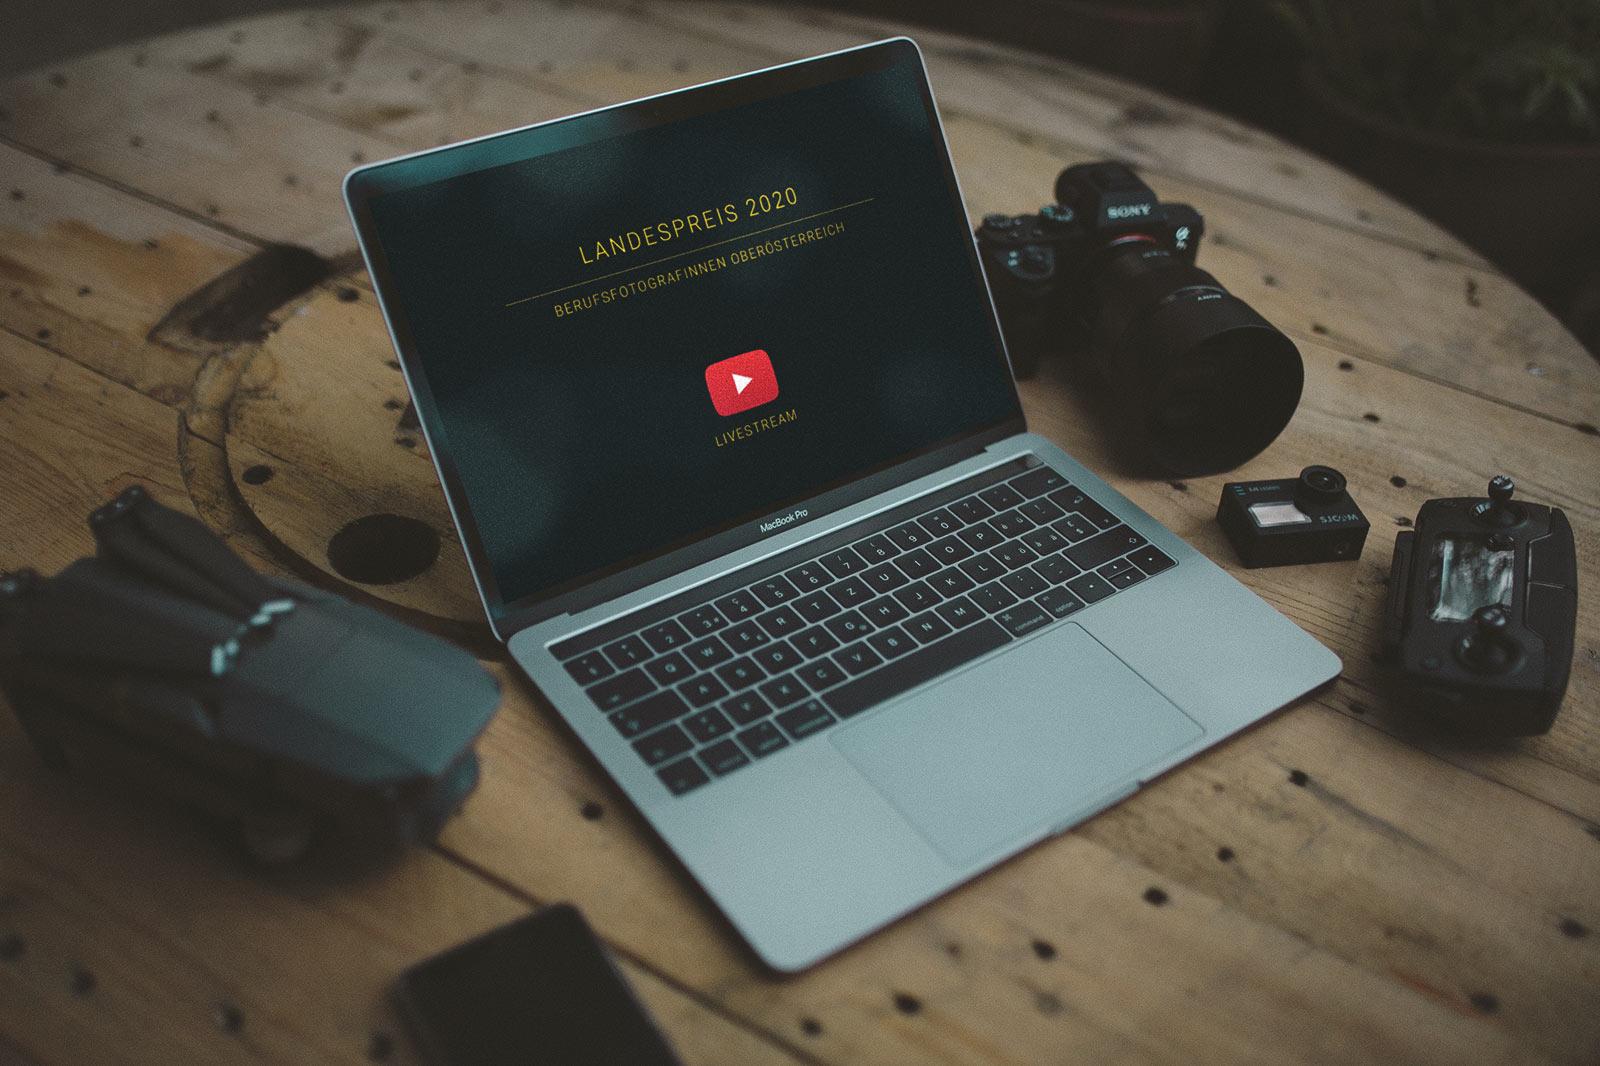 Landespreis Youtube Livestream